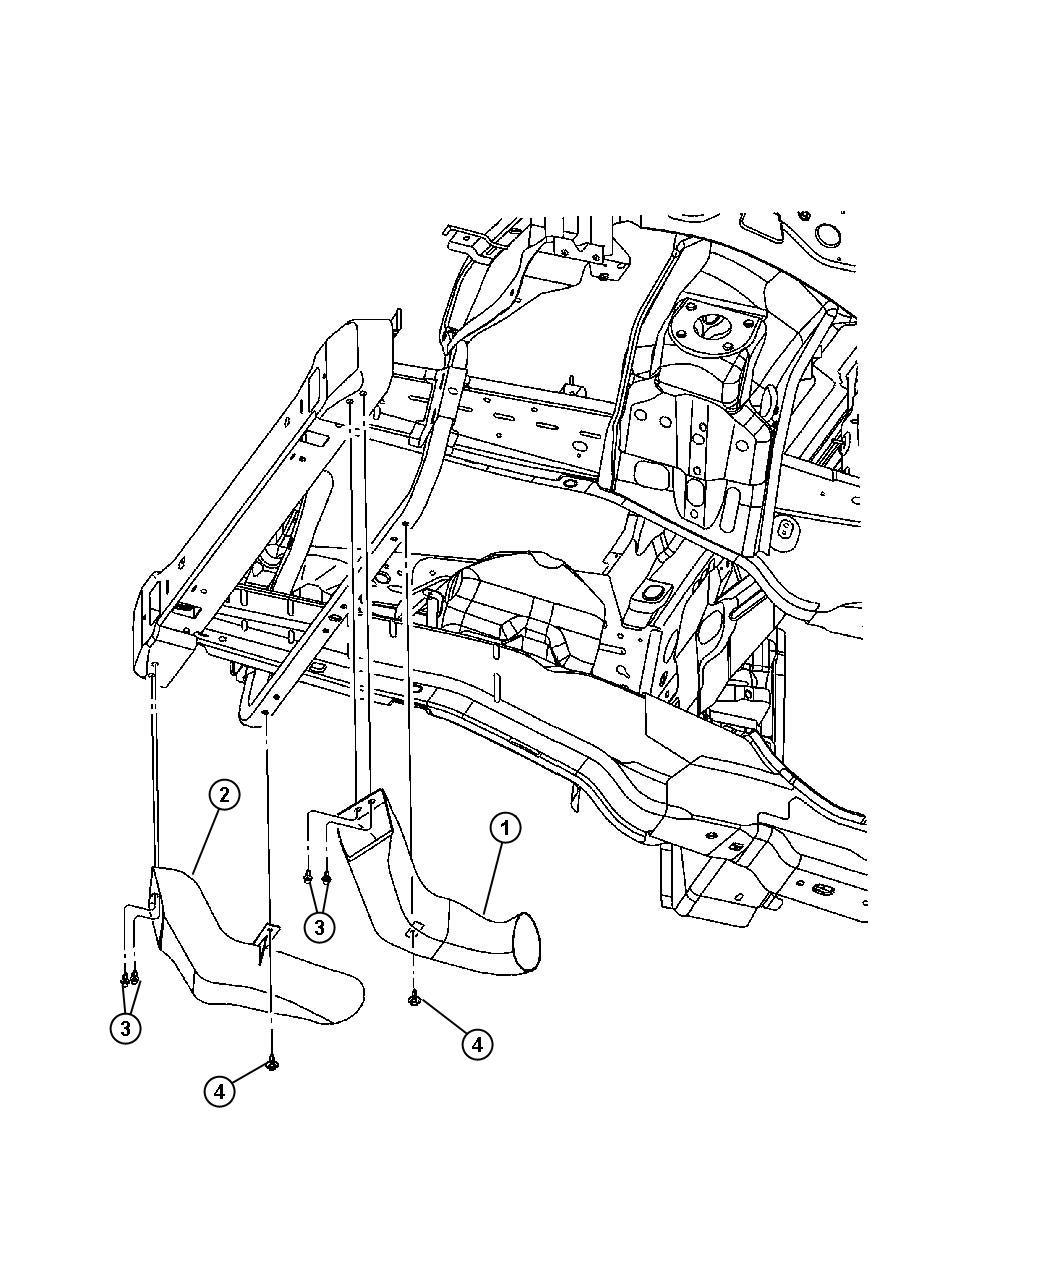 Jeep Grand Cherokee Limited Pin Push Pin M11 4 M8x21